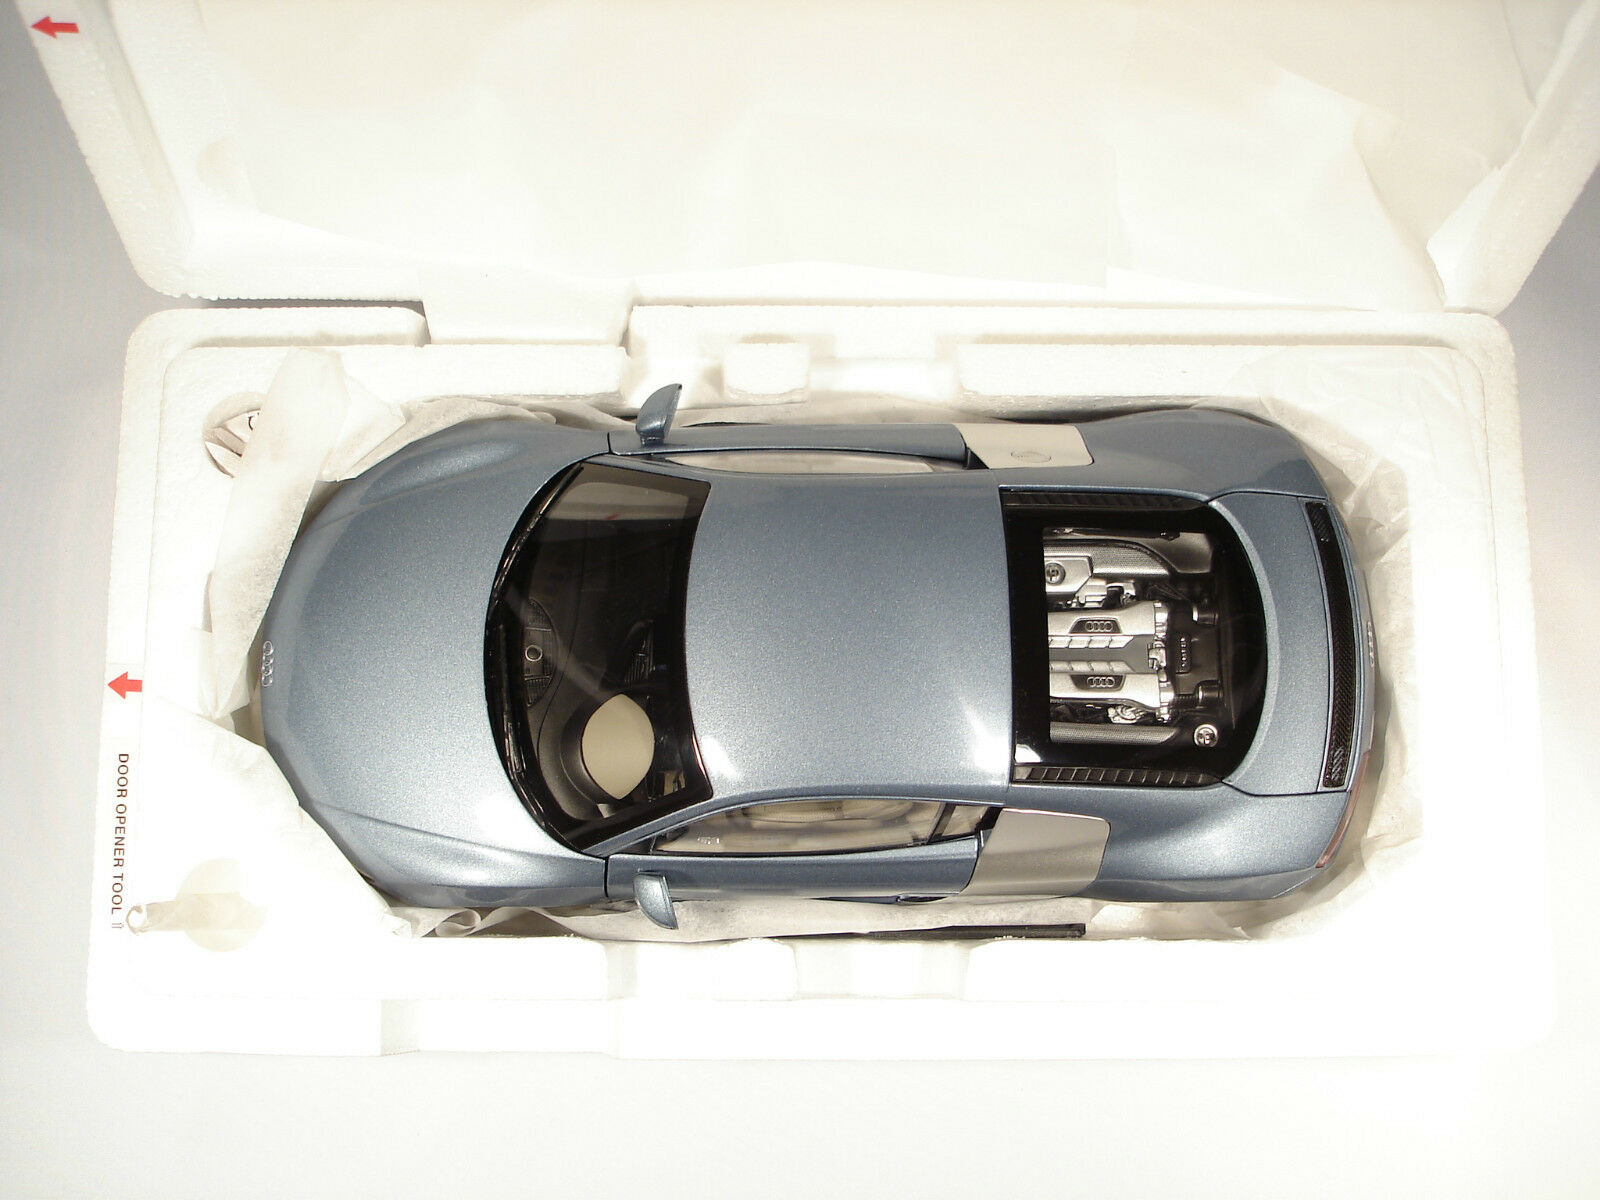 Kyosho 501.06.184.15 1 18 Audi R8 V8 4.2 FSI Jetblue Métal